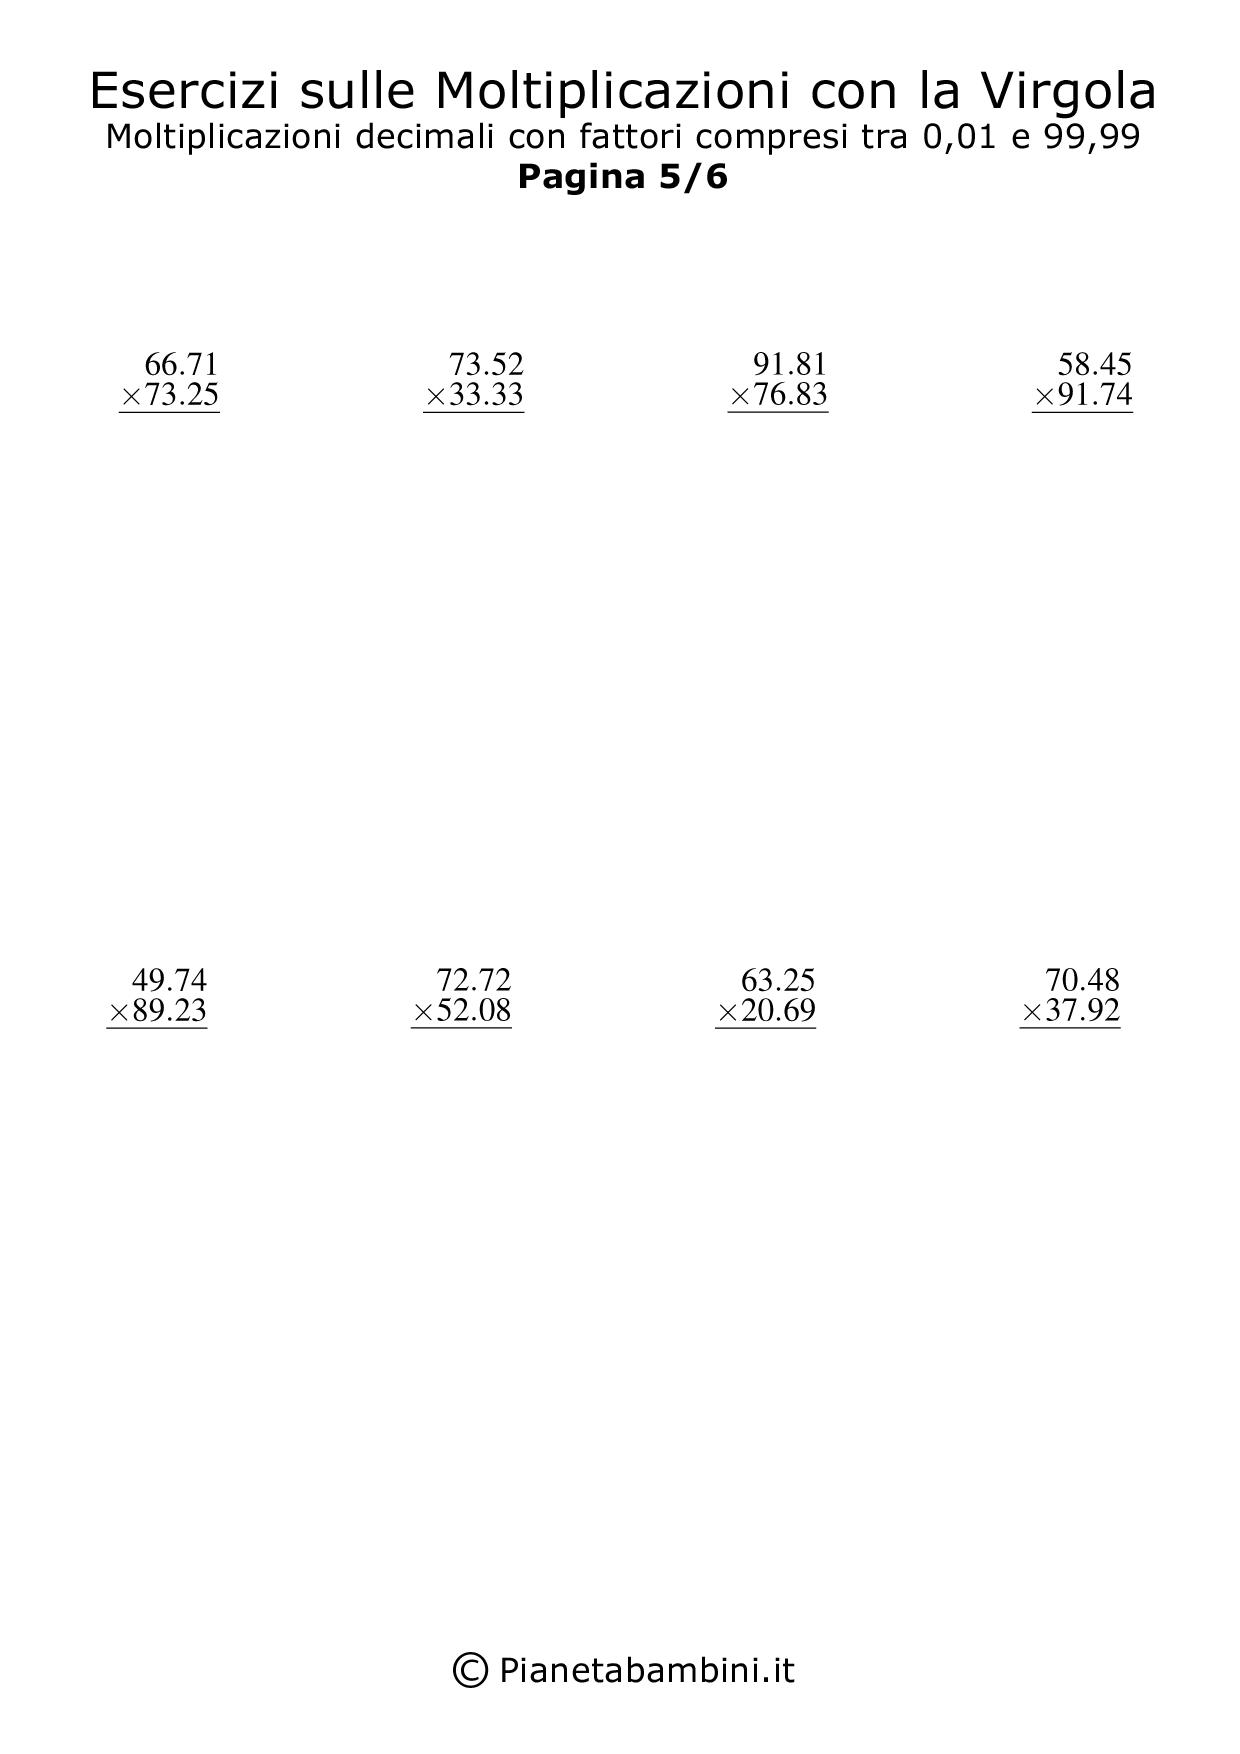 Moltiplicazioni-Virgola-0.01-99.99_5